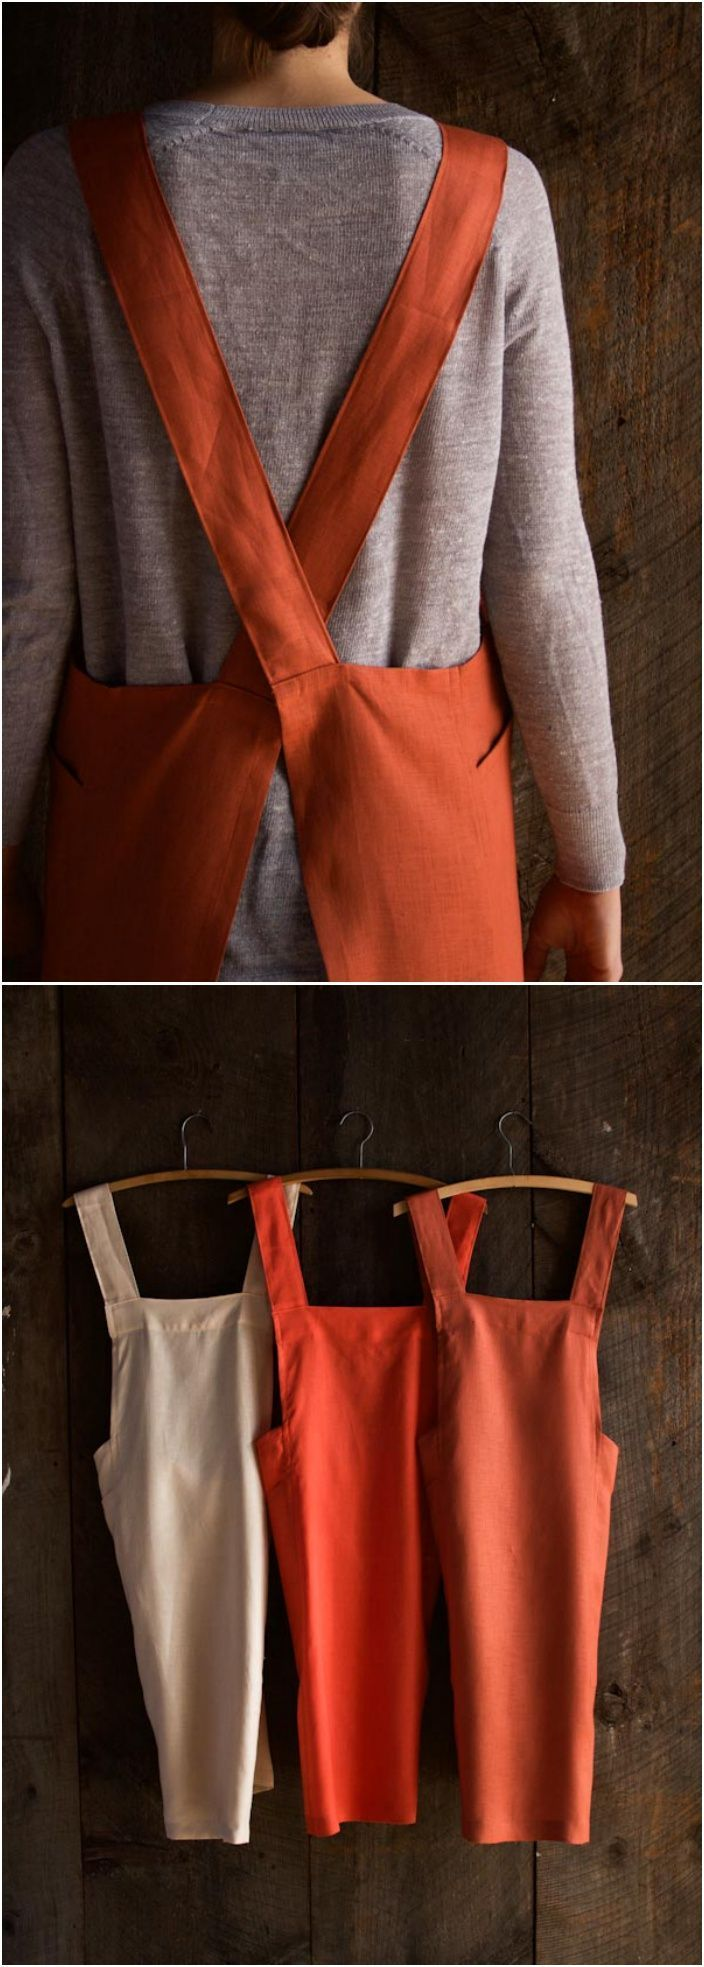 The white apron english translation - 16 Diy Apron Sewing Patterns